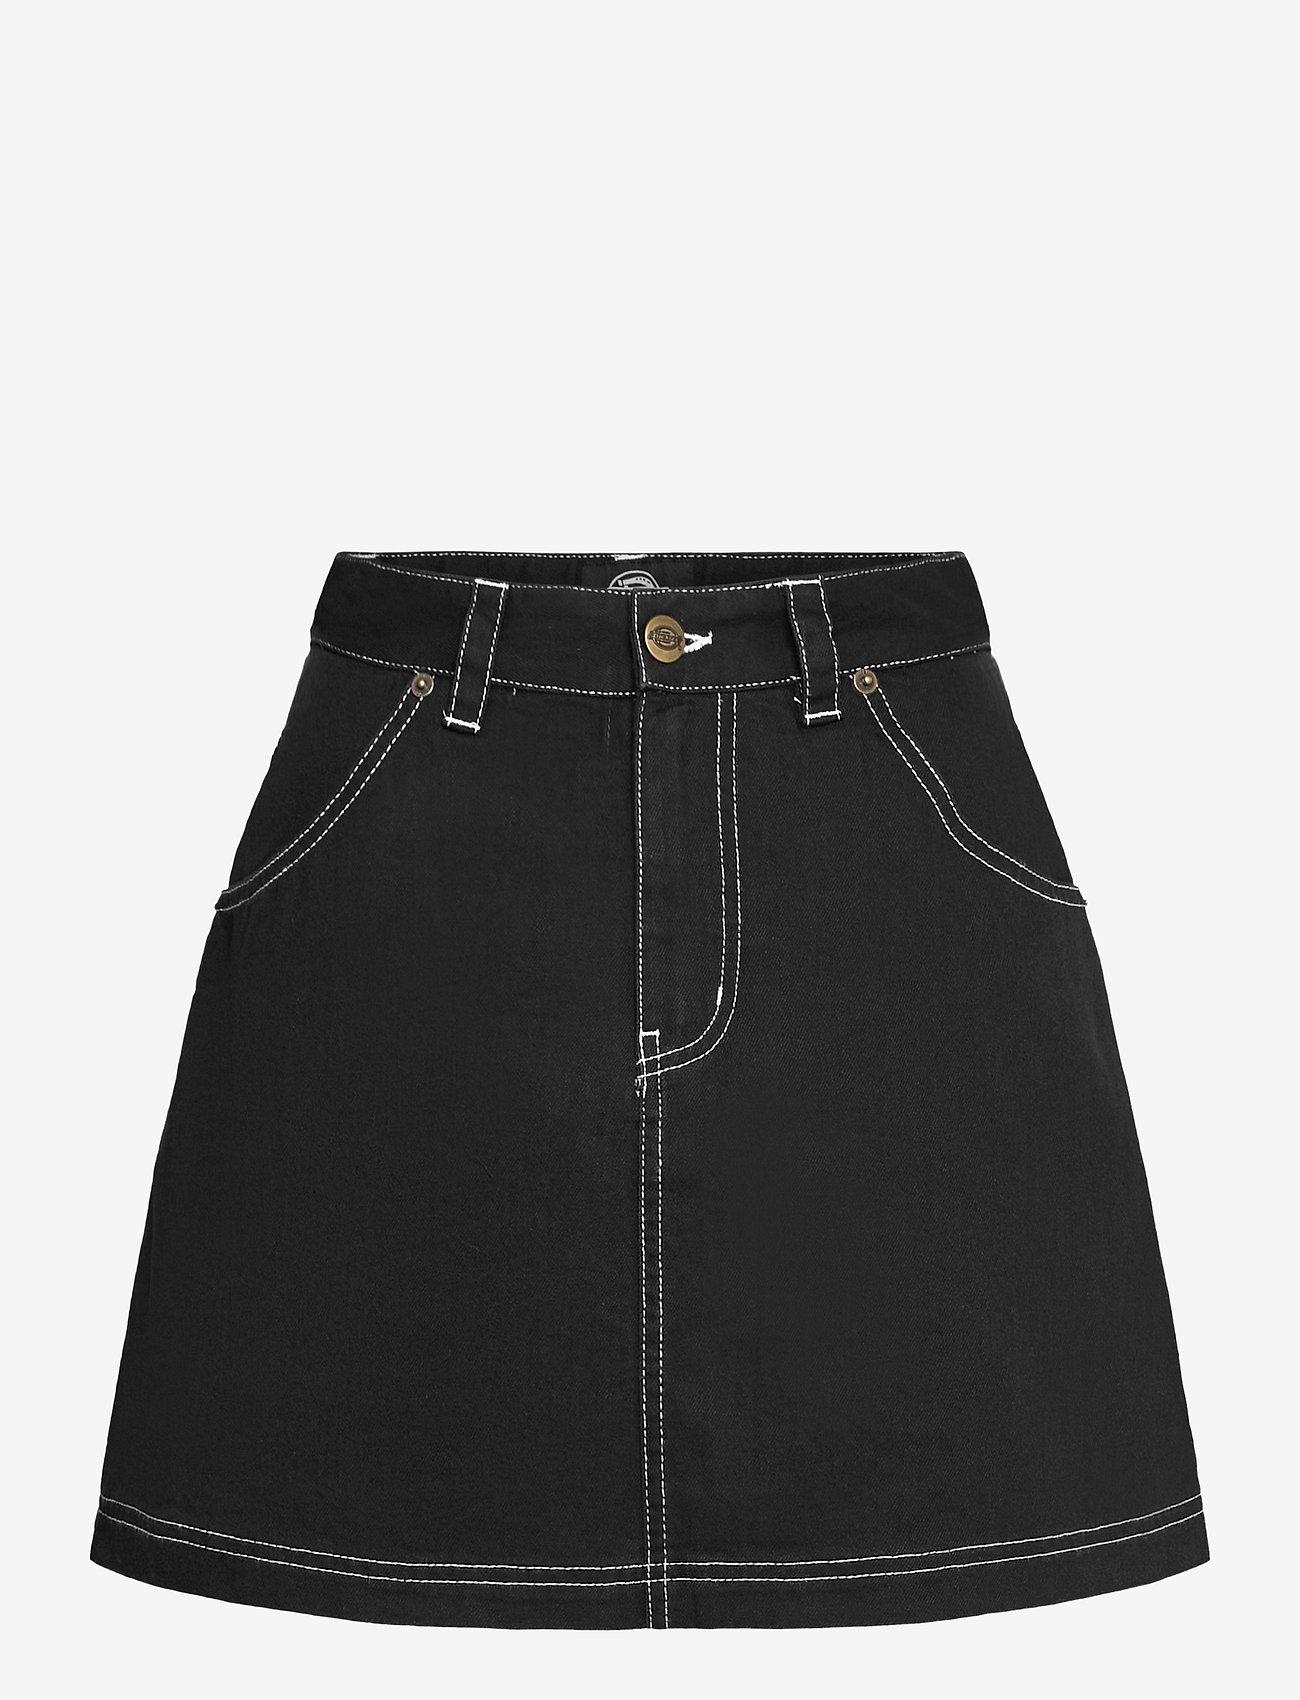 Dickies - SHONGALOO - jeanskjolar - black - 0